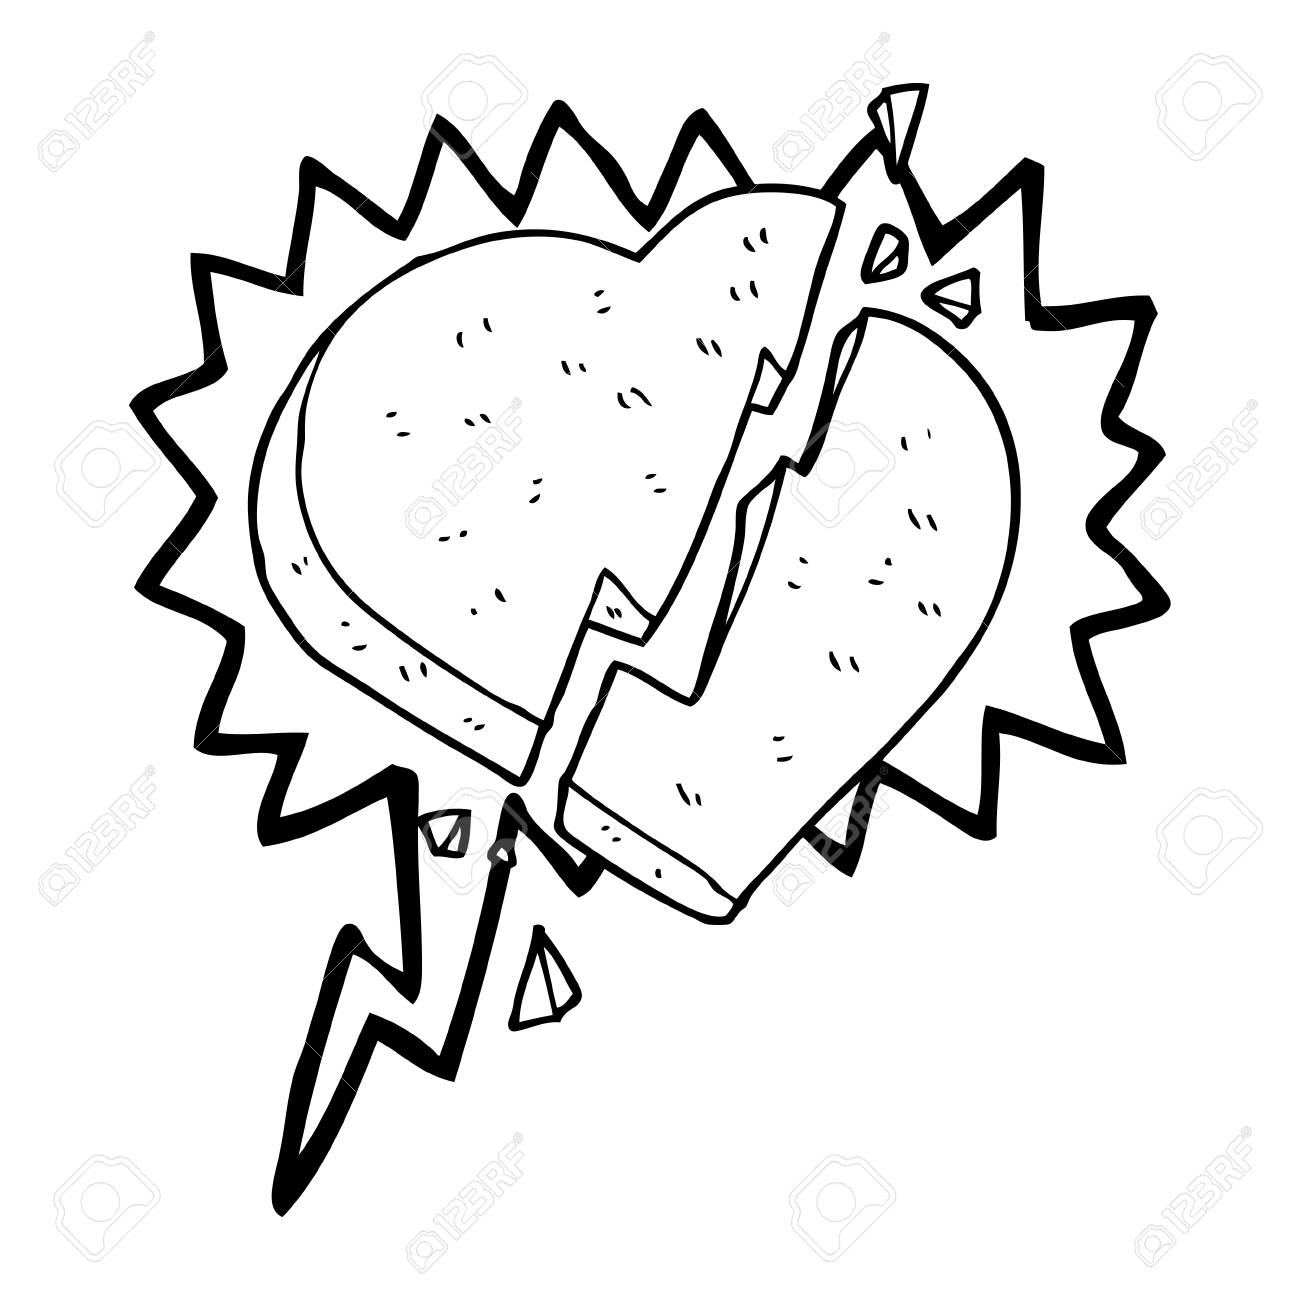 Freehand Drawn Speech Bubble Cartoon Broken Heart Symbol Royalty